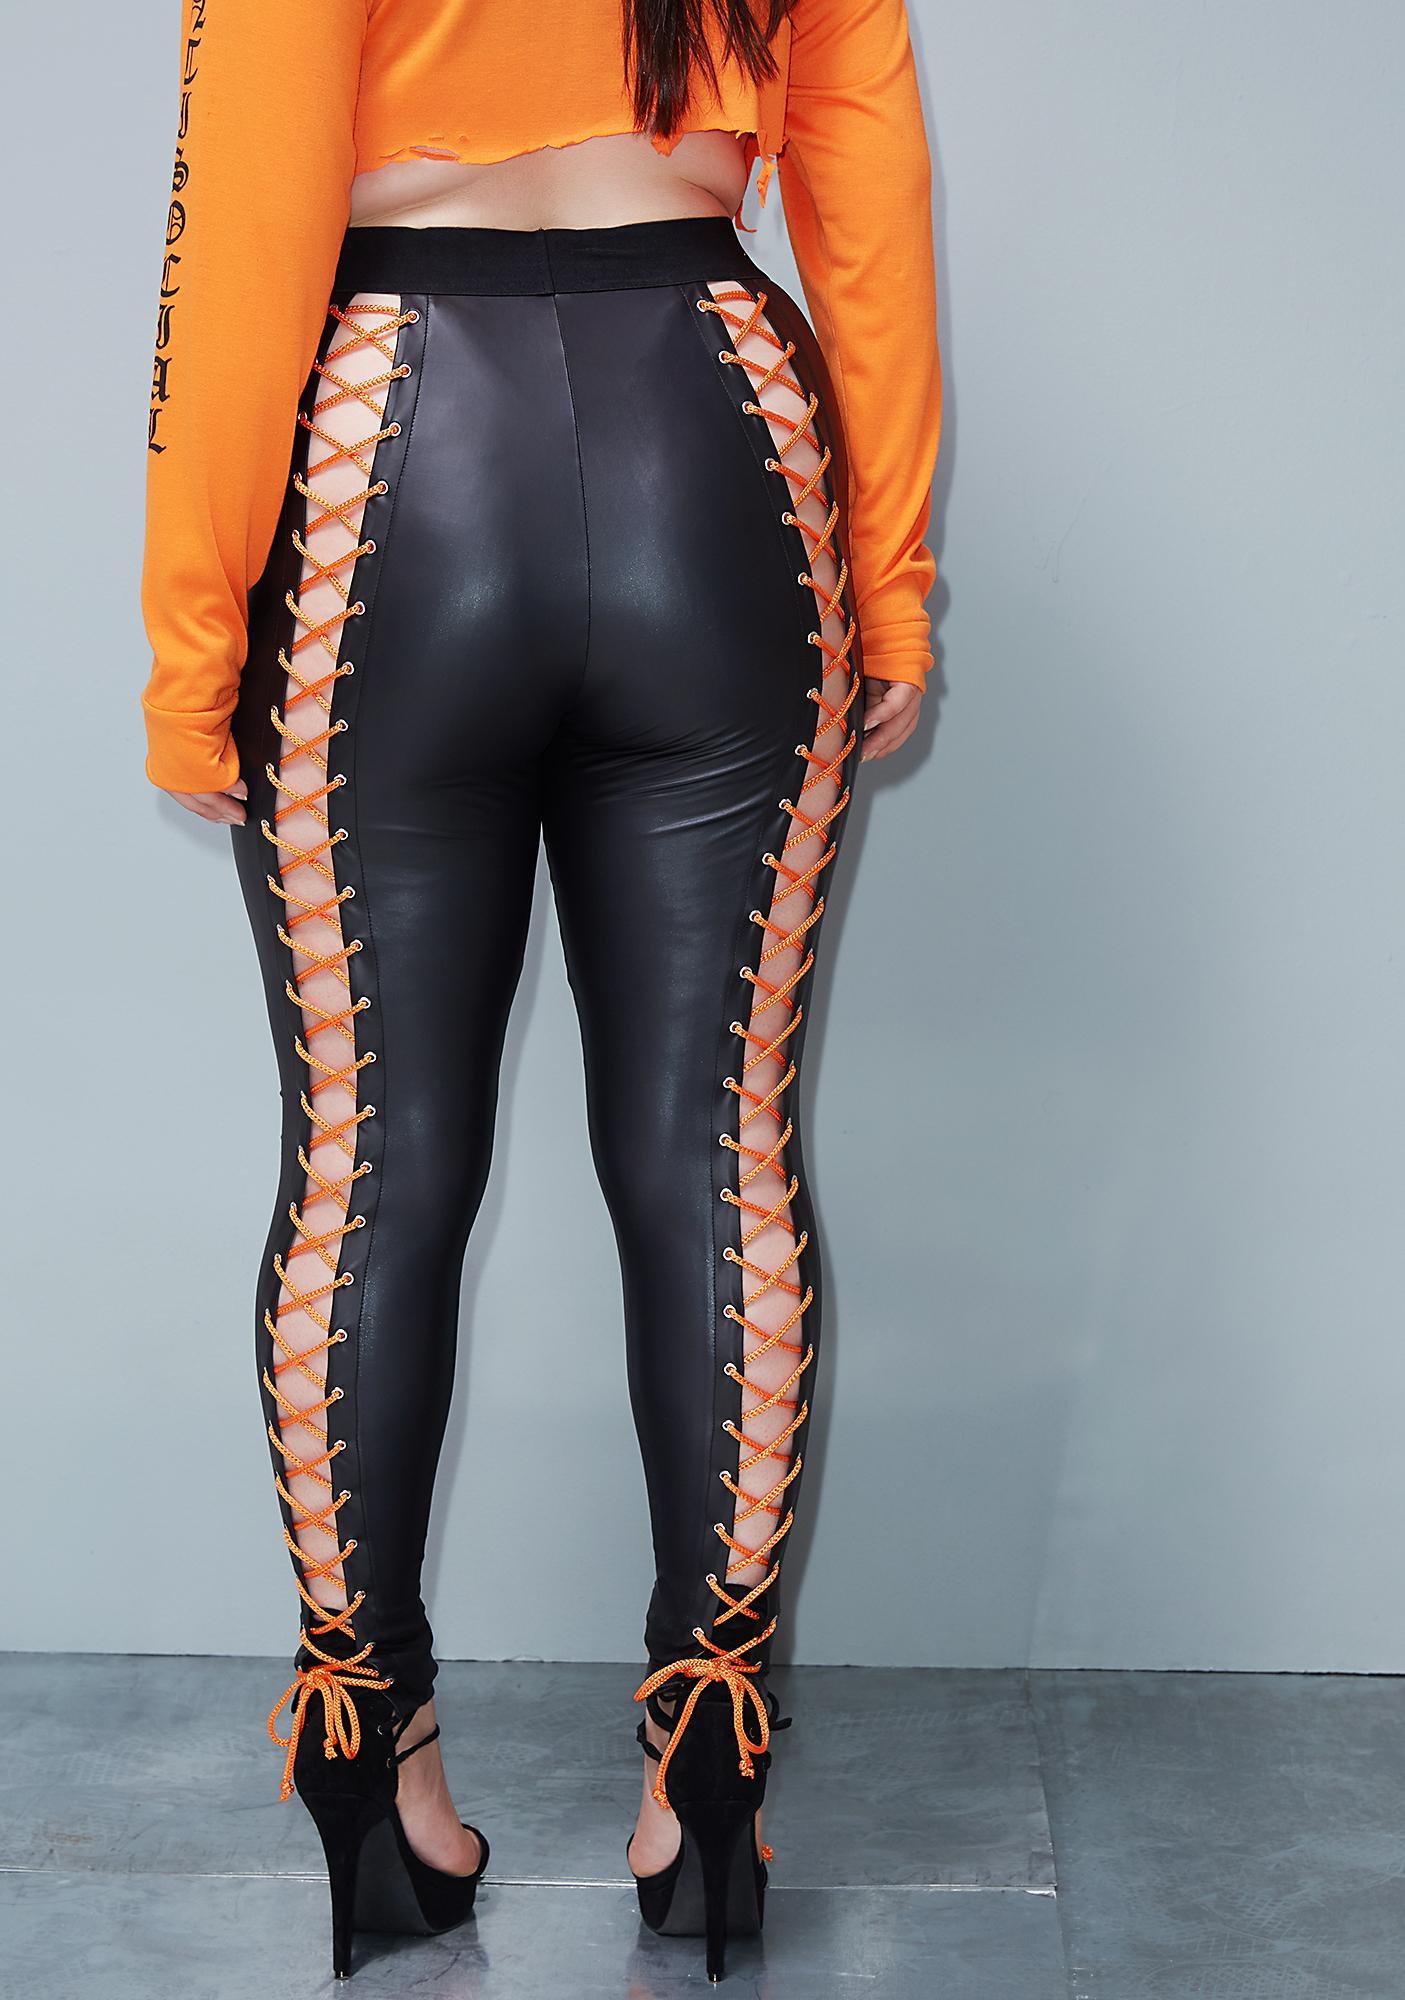 4a92c8f71eacc Poster Grl Plus Size Corset Leggings | Dolls Kill